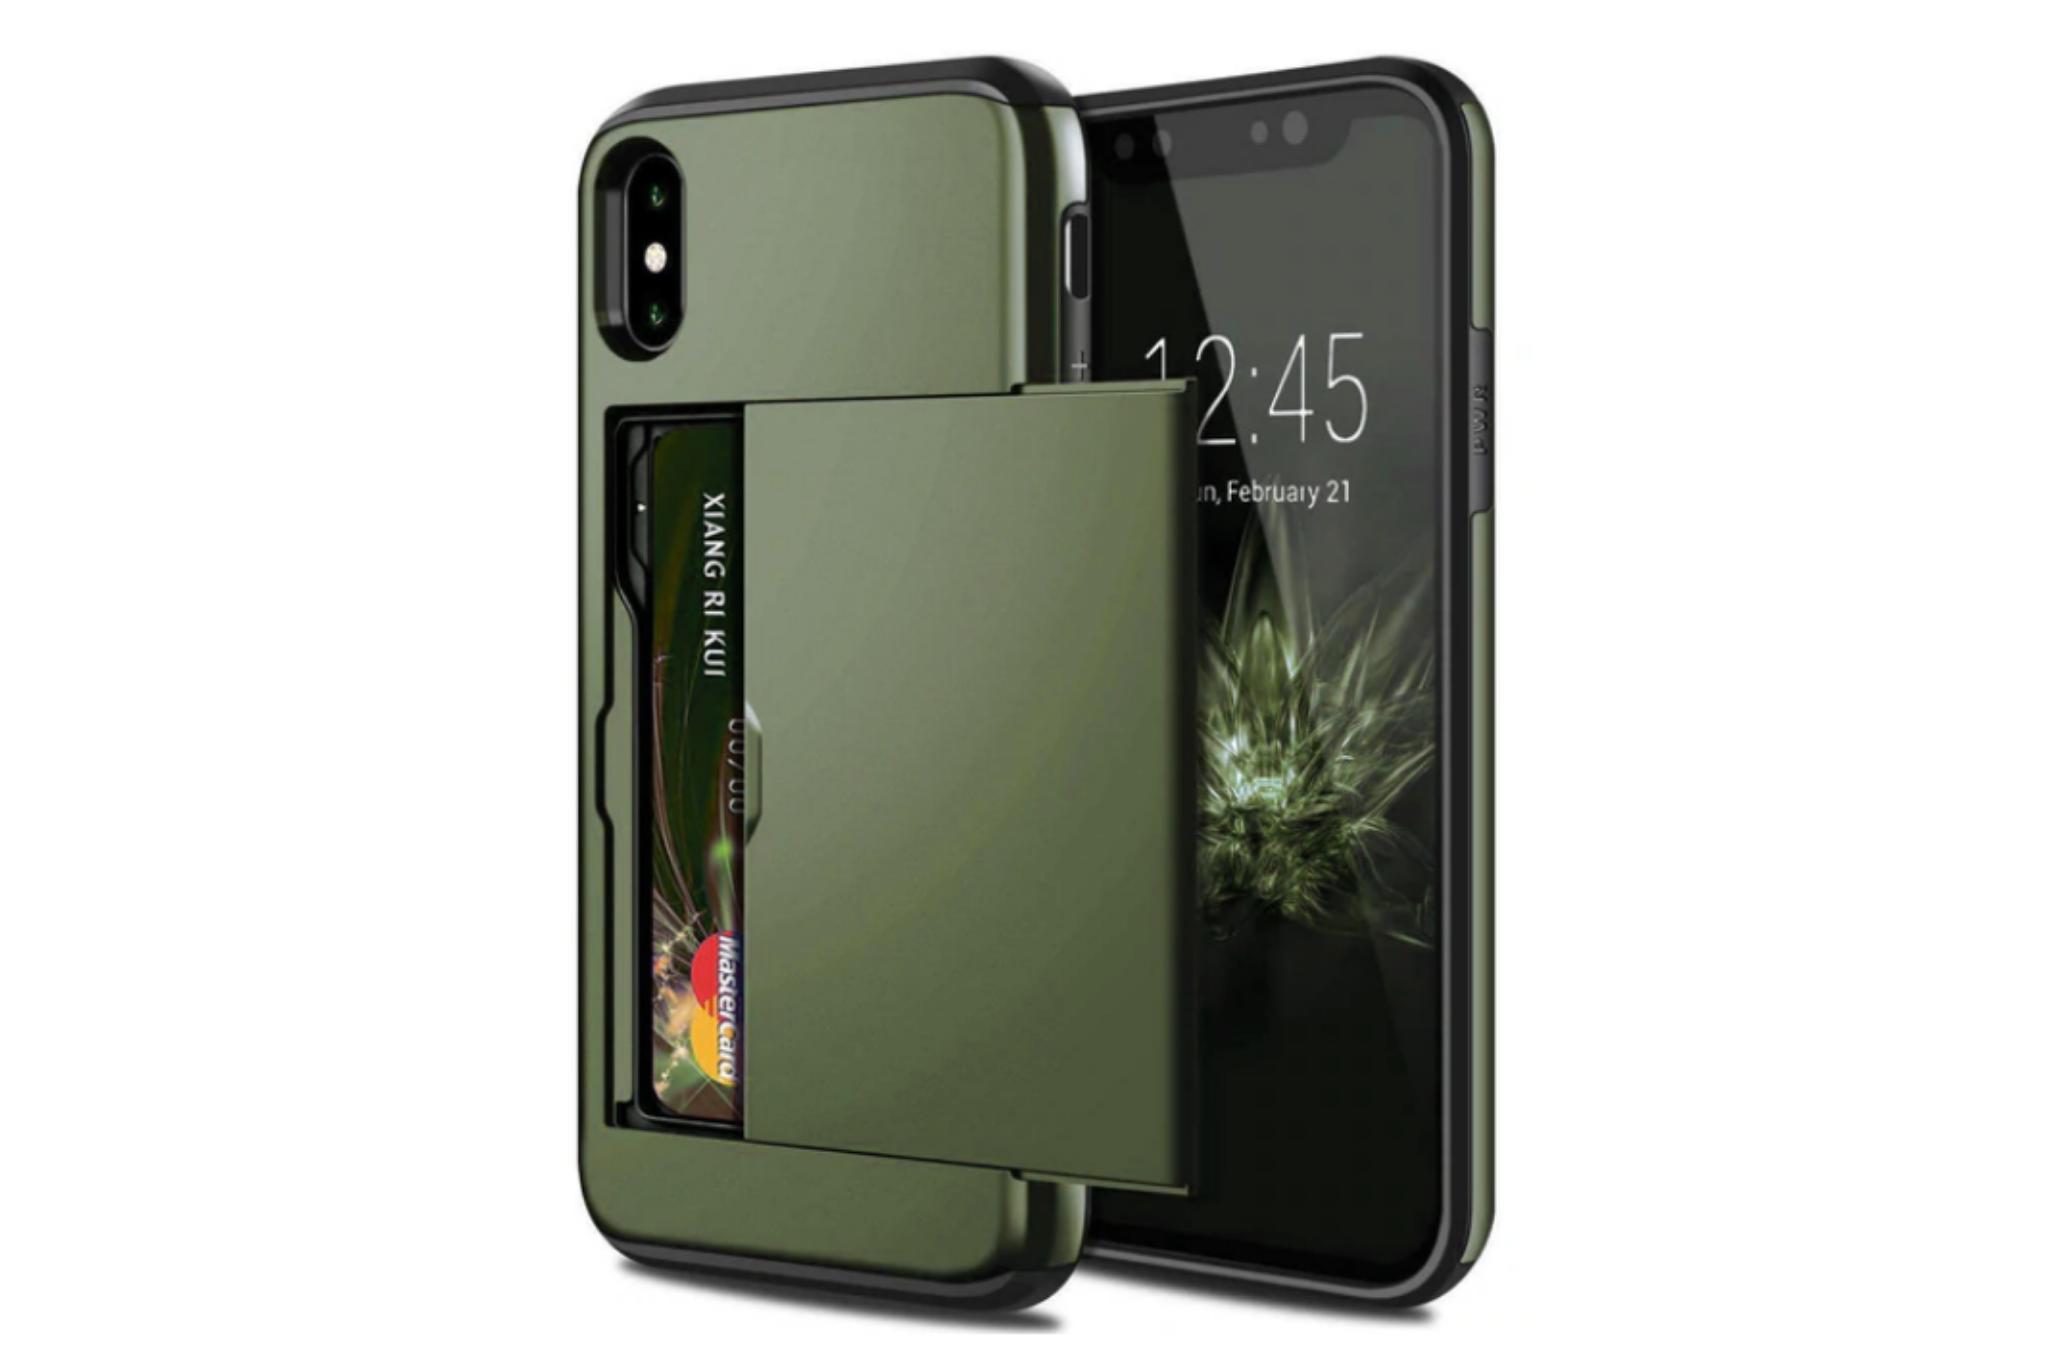 Smartphonehoesje iPhone 11 Pro | Pasjesschuif groen